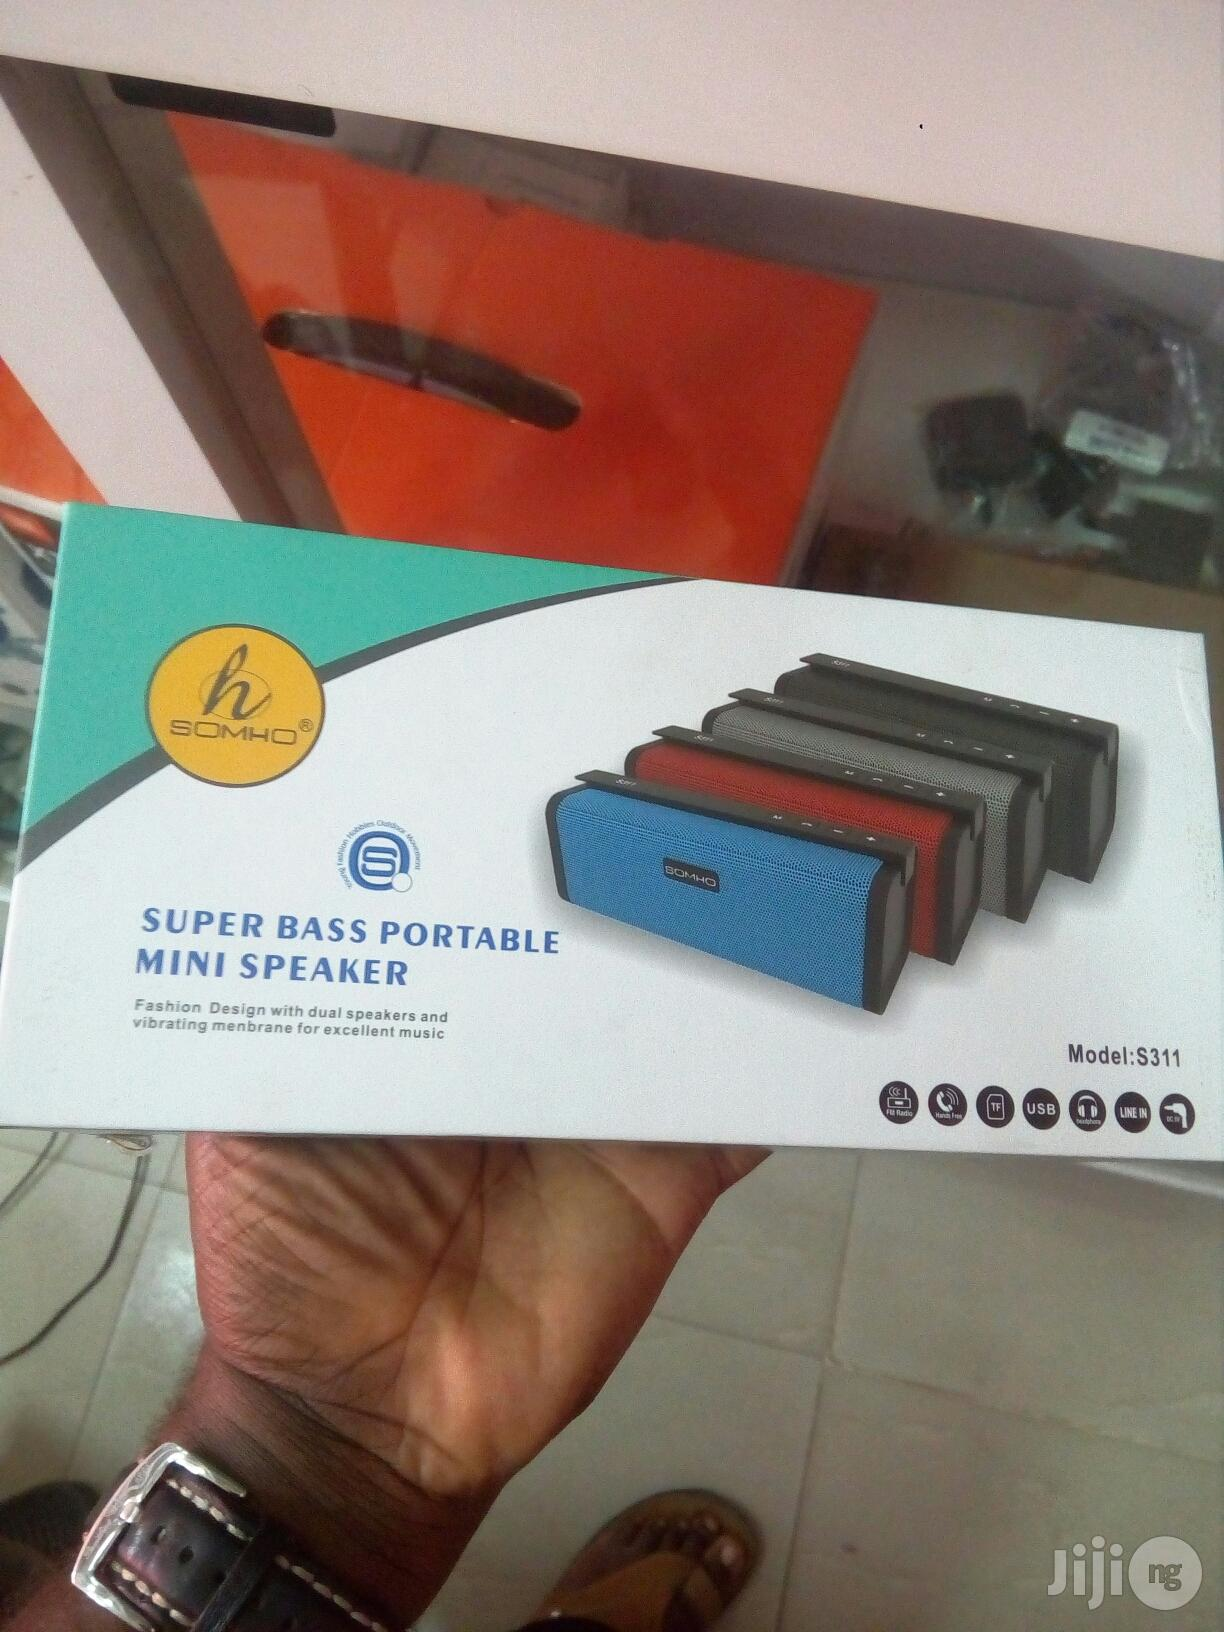 Somho Portable Bluetooth Speaker Mini S311